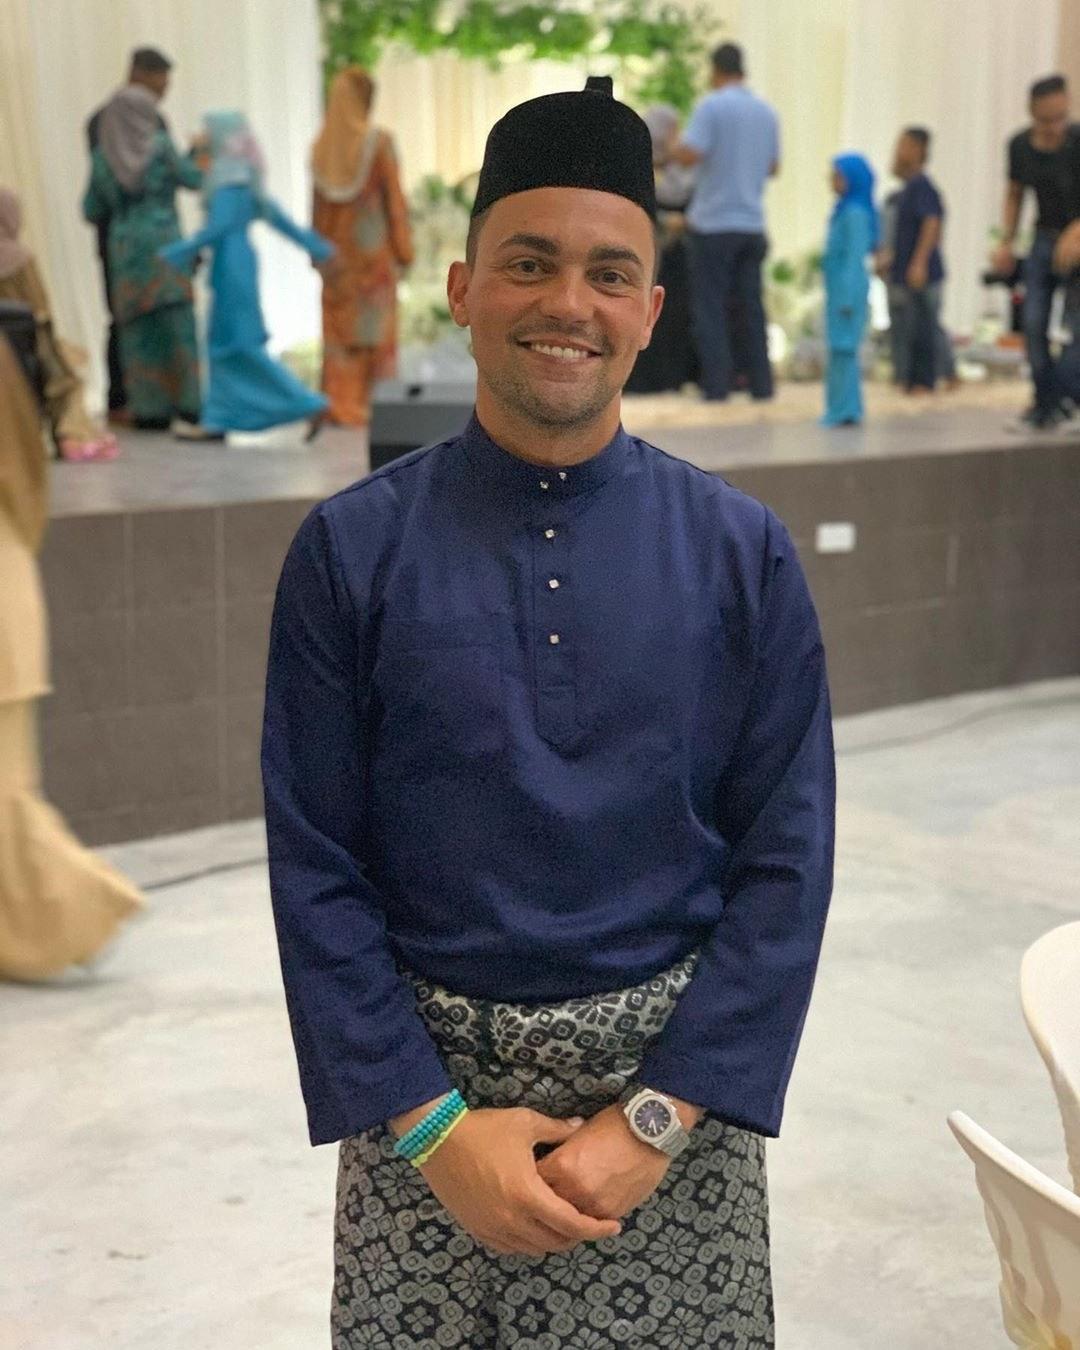 Design Gaun Pengantin Muslimah Warna Merah Tldn Instagram Posts at Jempol Negeri Sembilan Malaysia